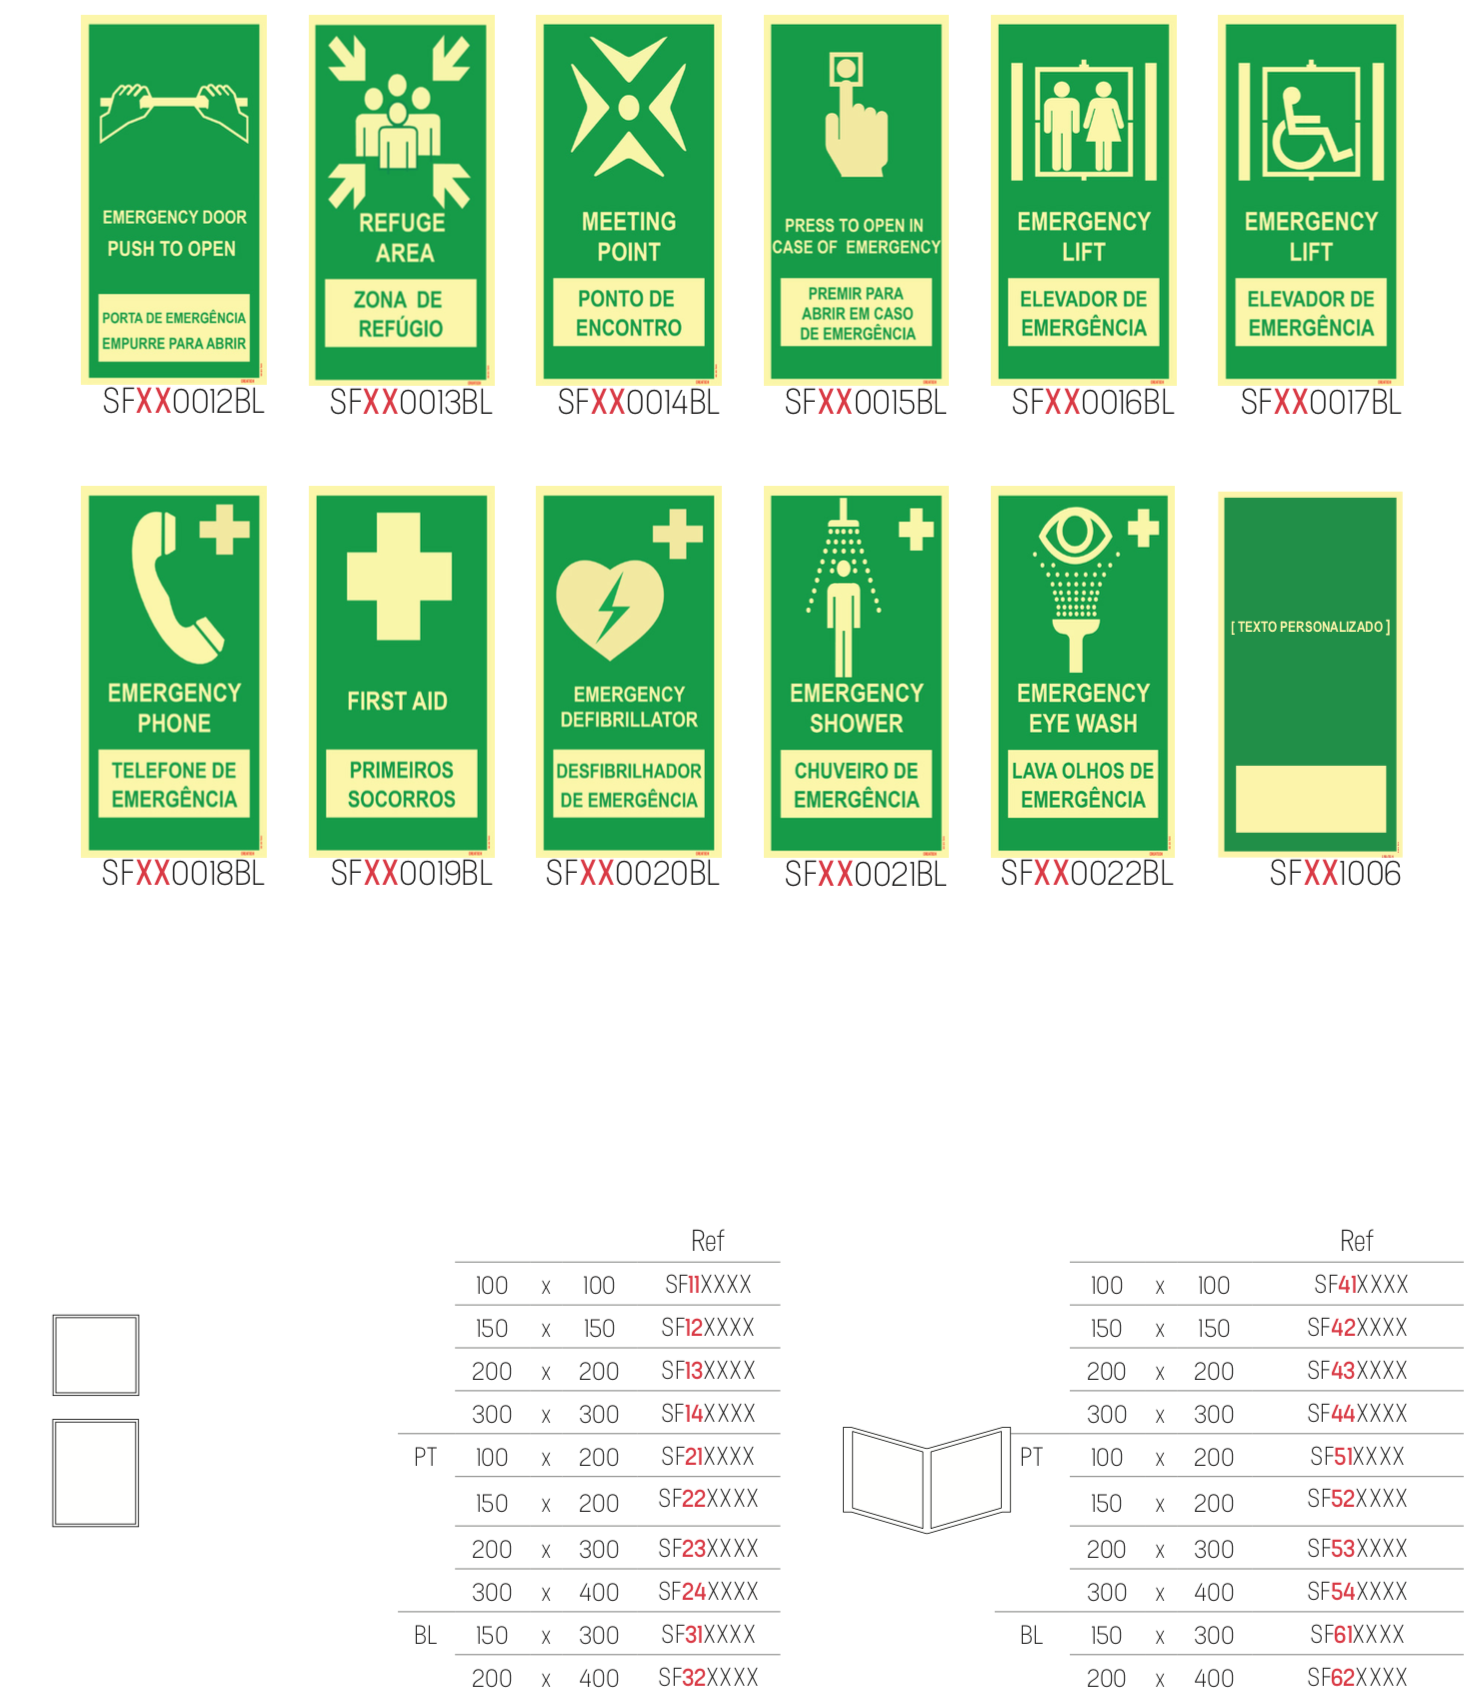 equipamentos_emergencia2